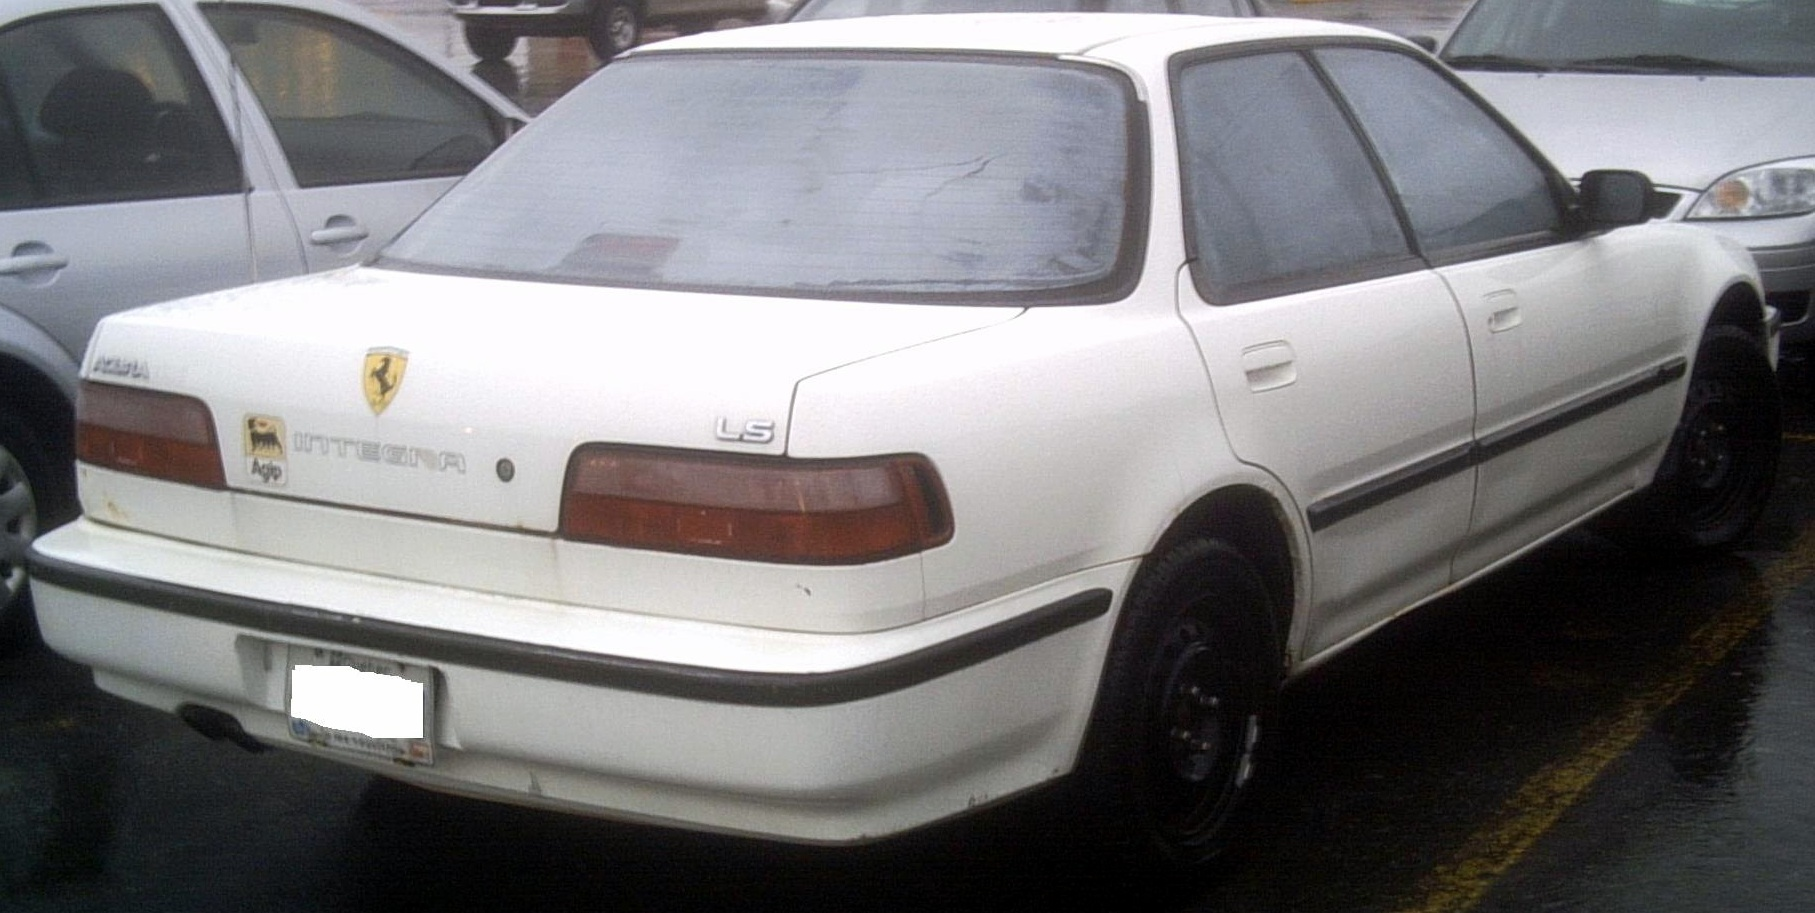 File:'90 Acura Integra Sedan -- Rear.JPG - Wikimedia Commons